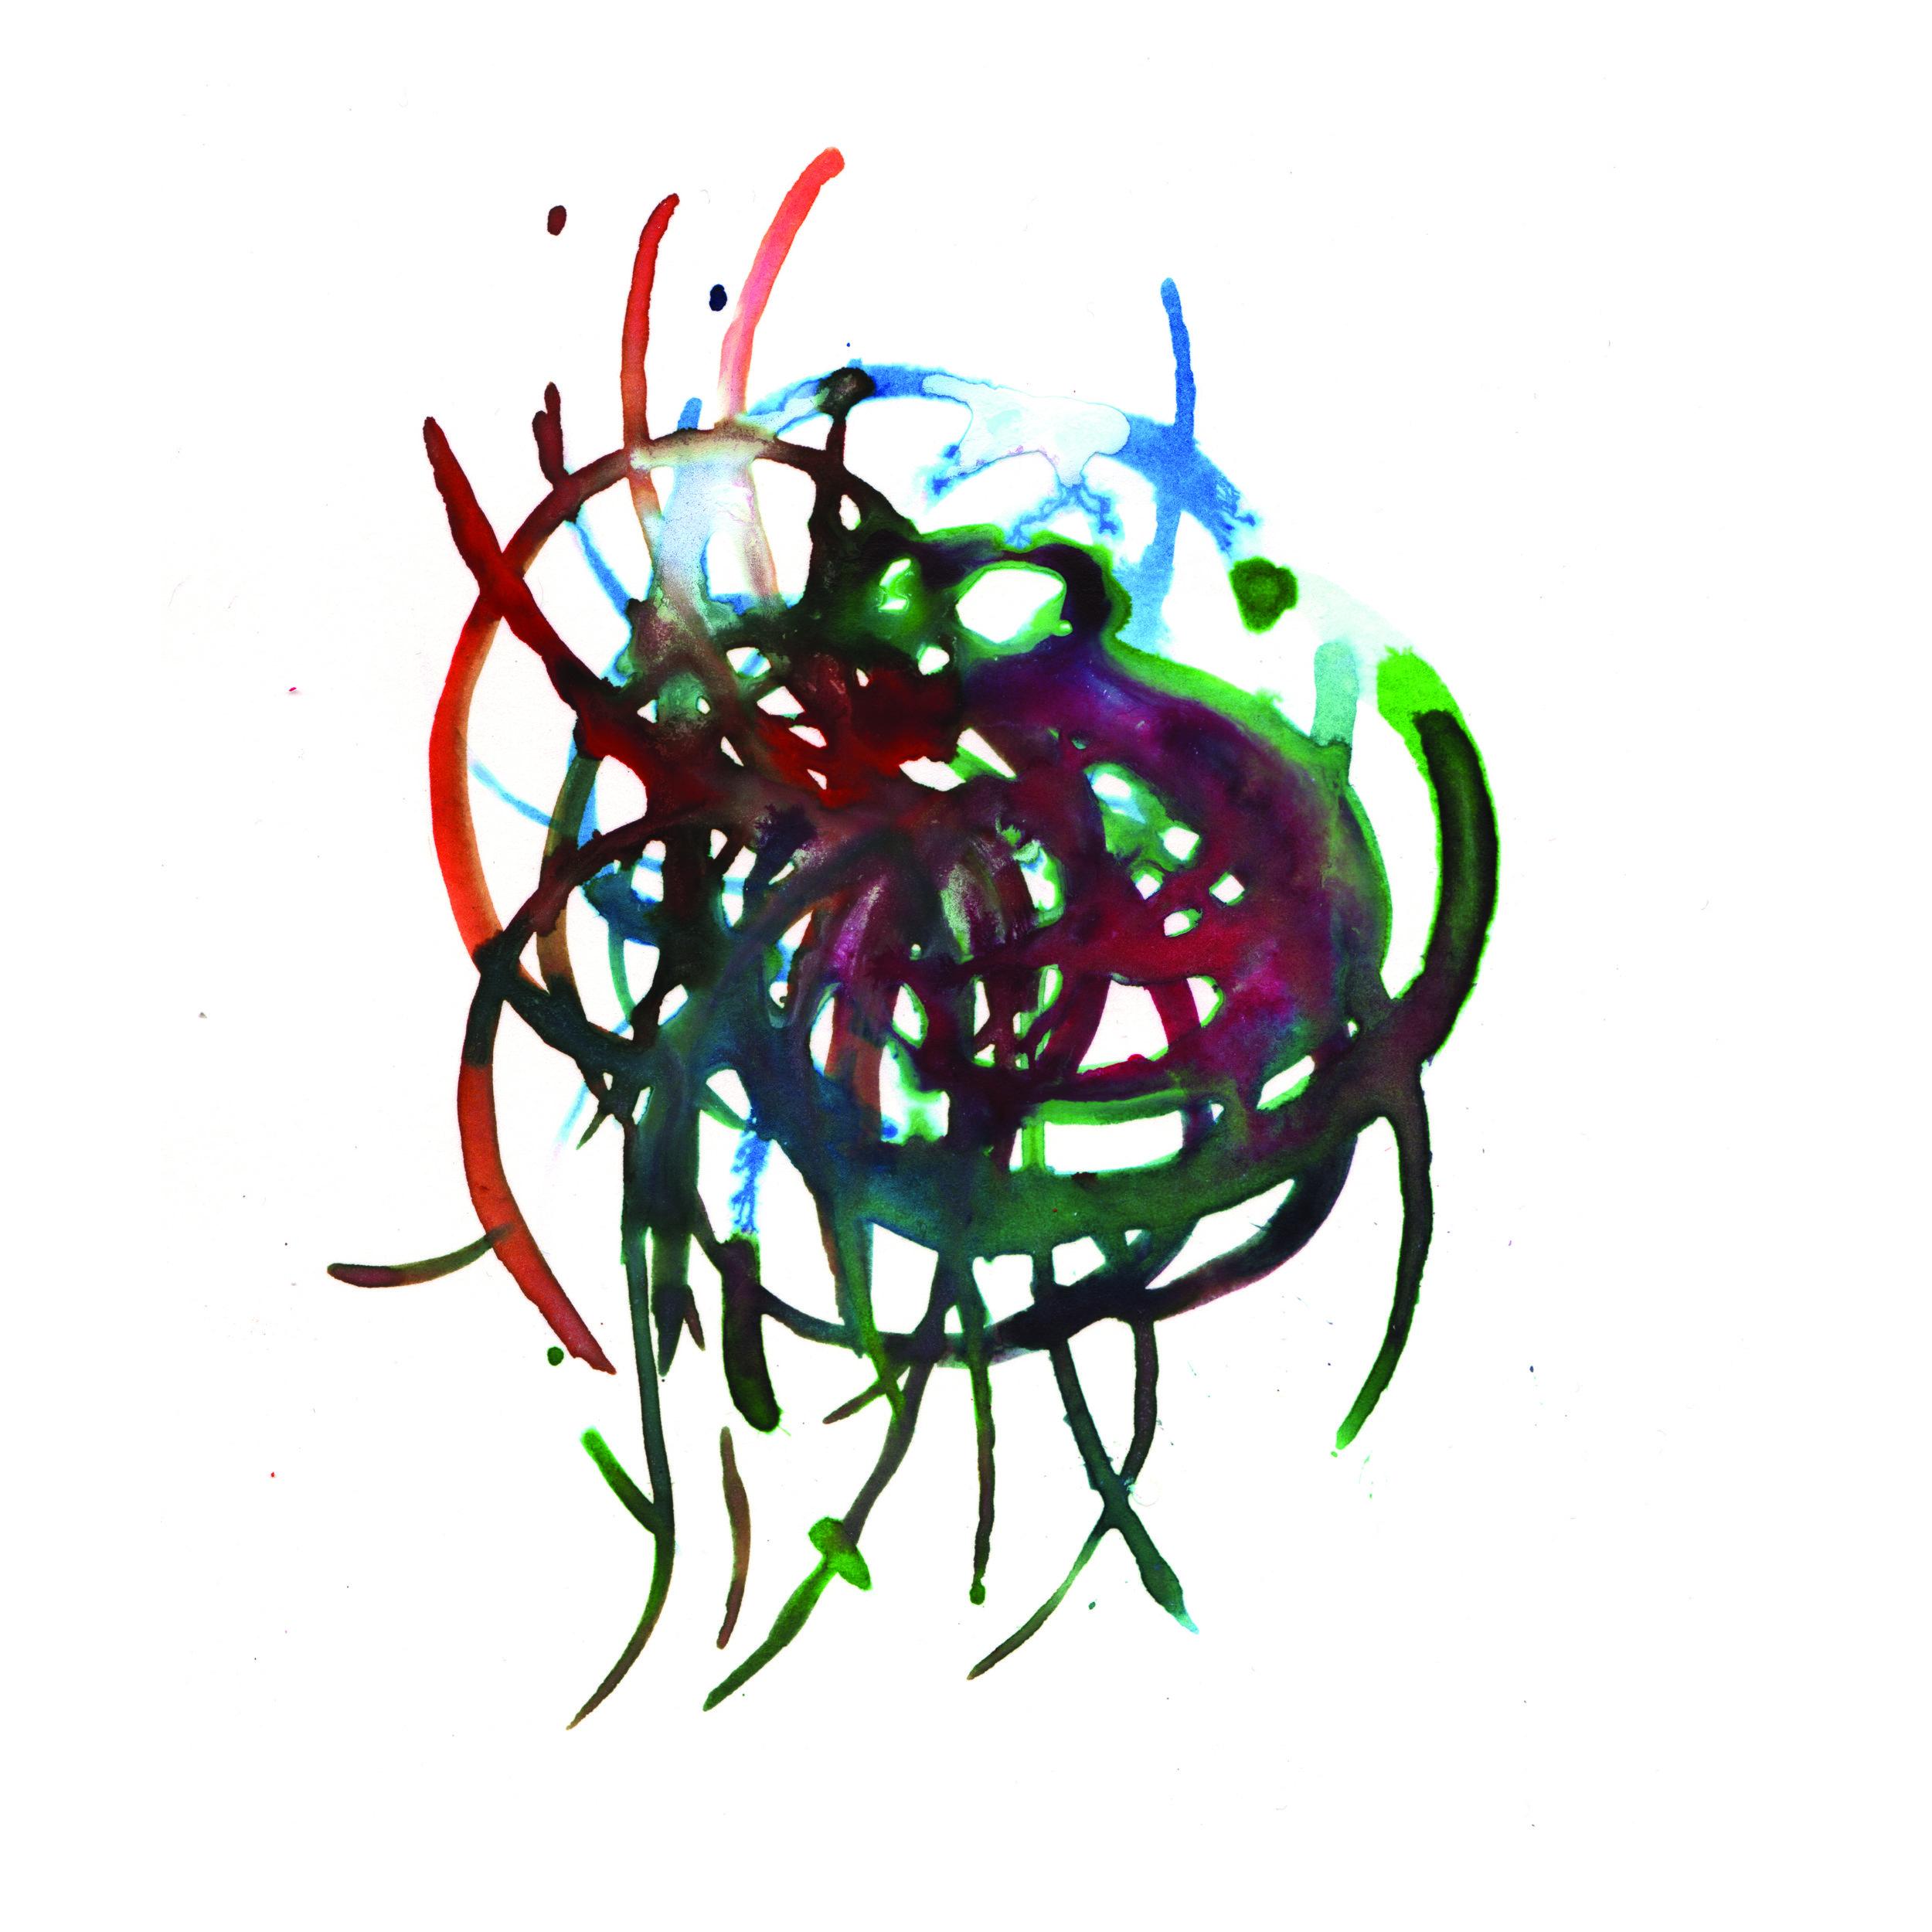 41.Bromeliad.3.21.14.jpg